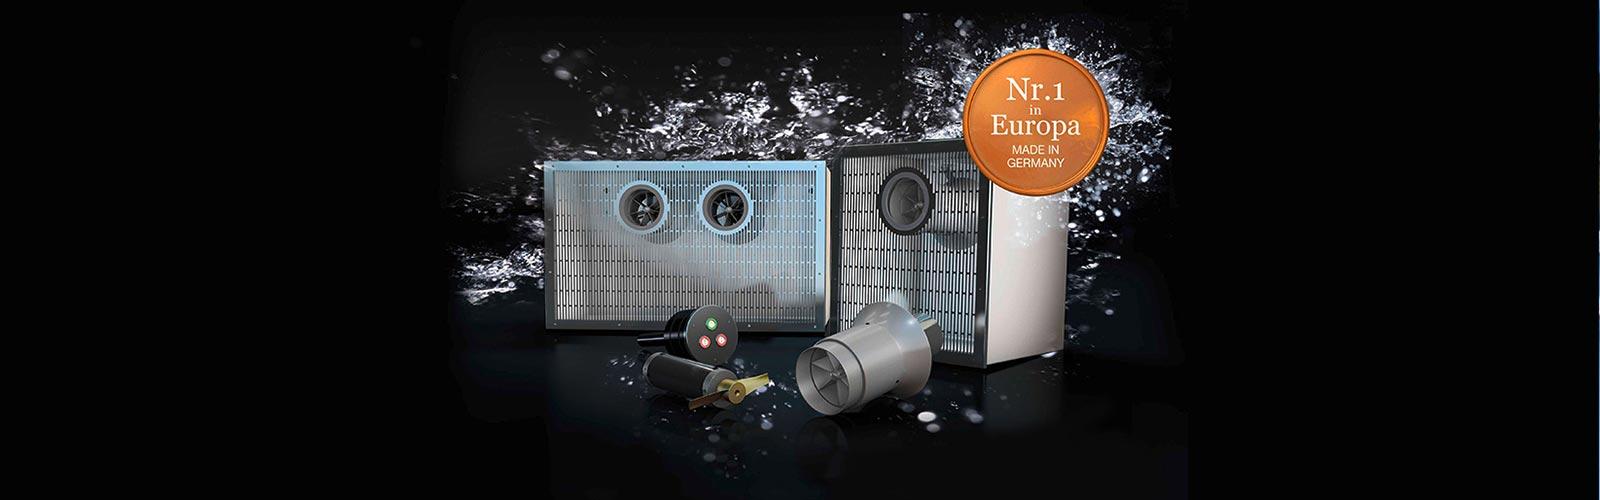 S&K GmbH Jacuzzi Whirlpool - HydroStar die Nr.1 in Europa